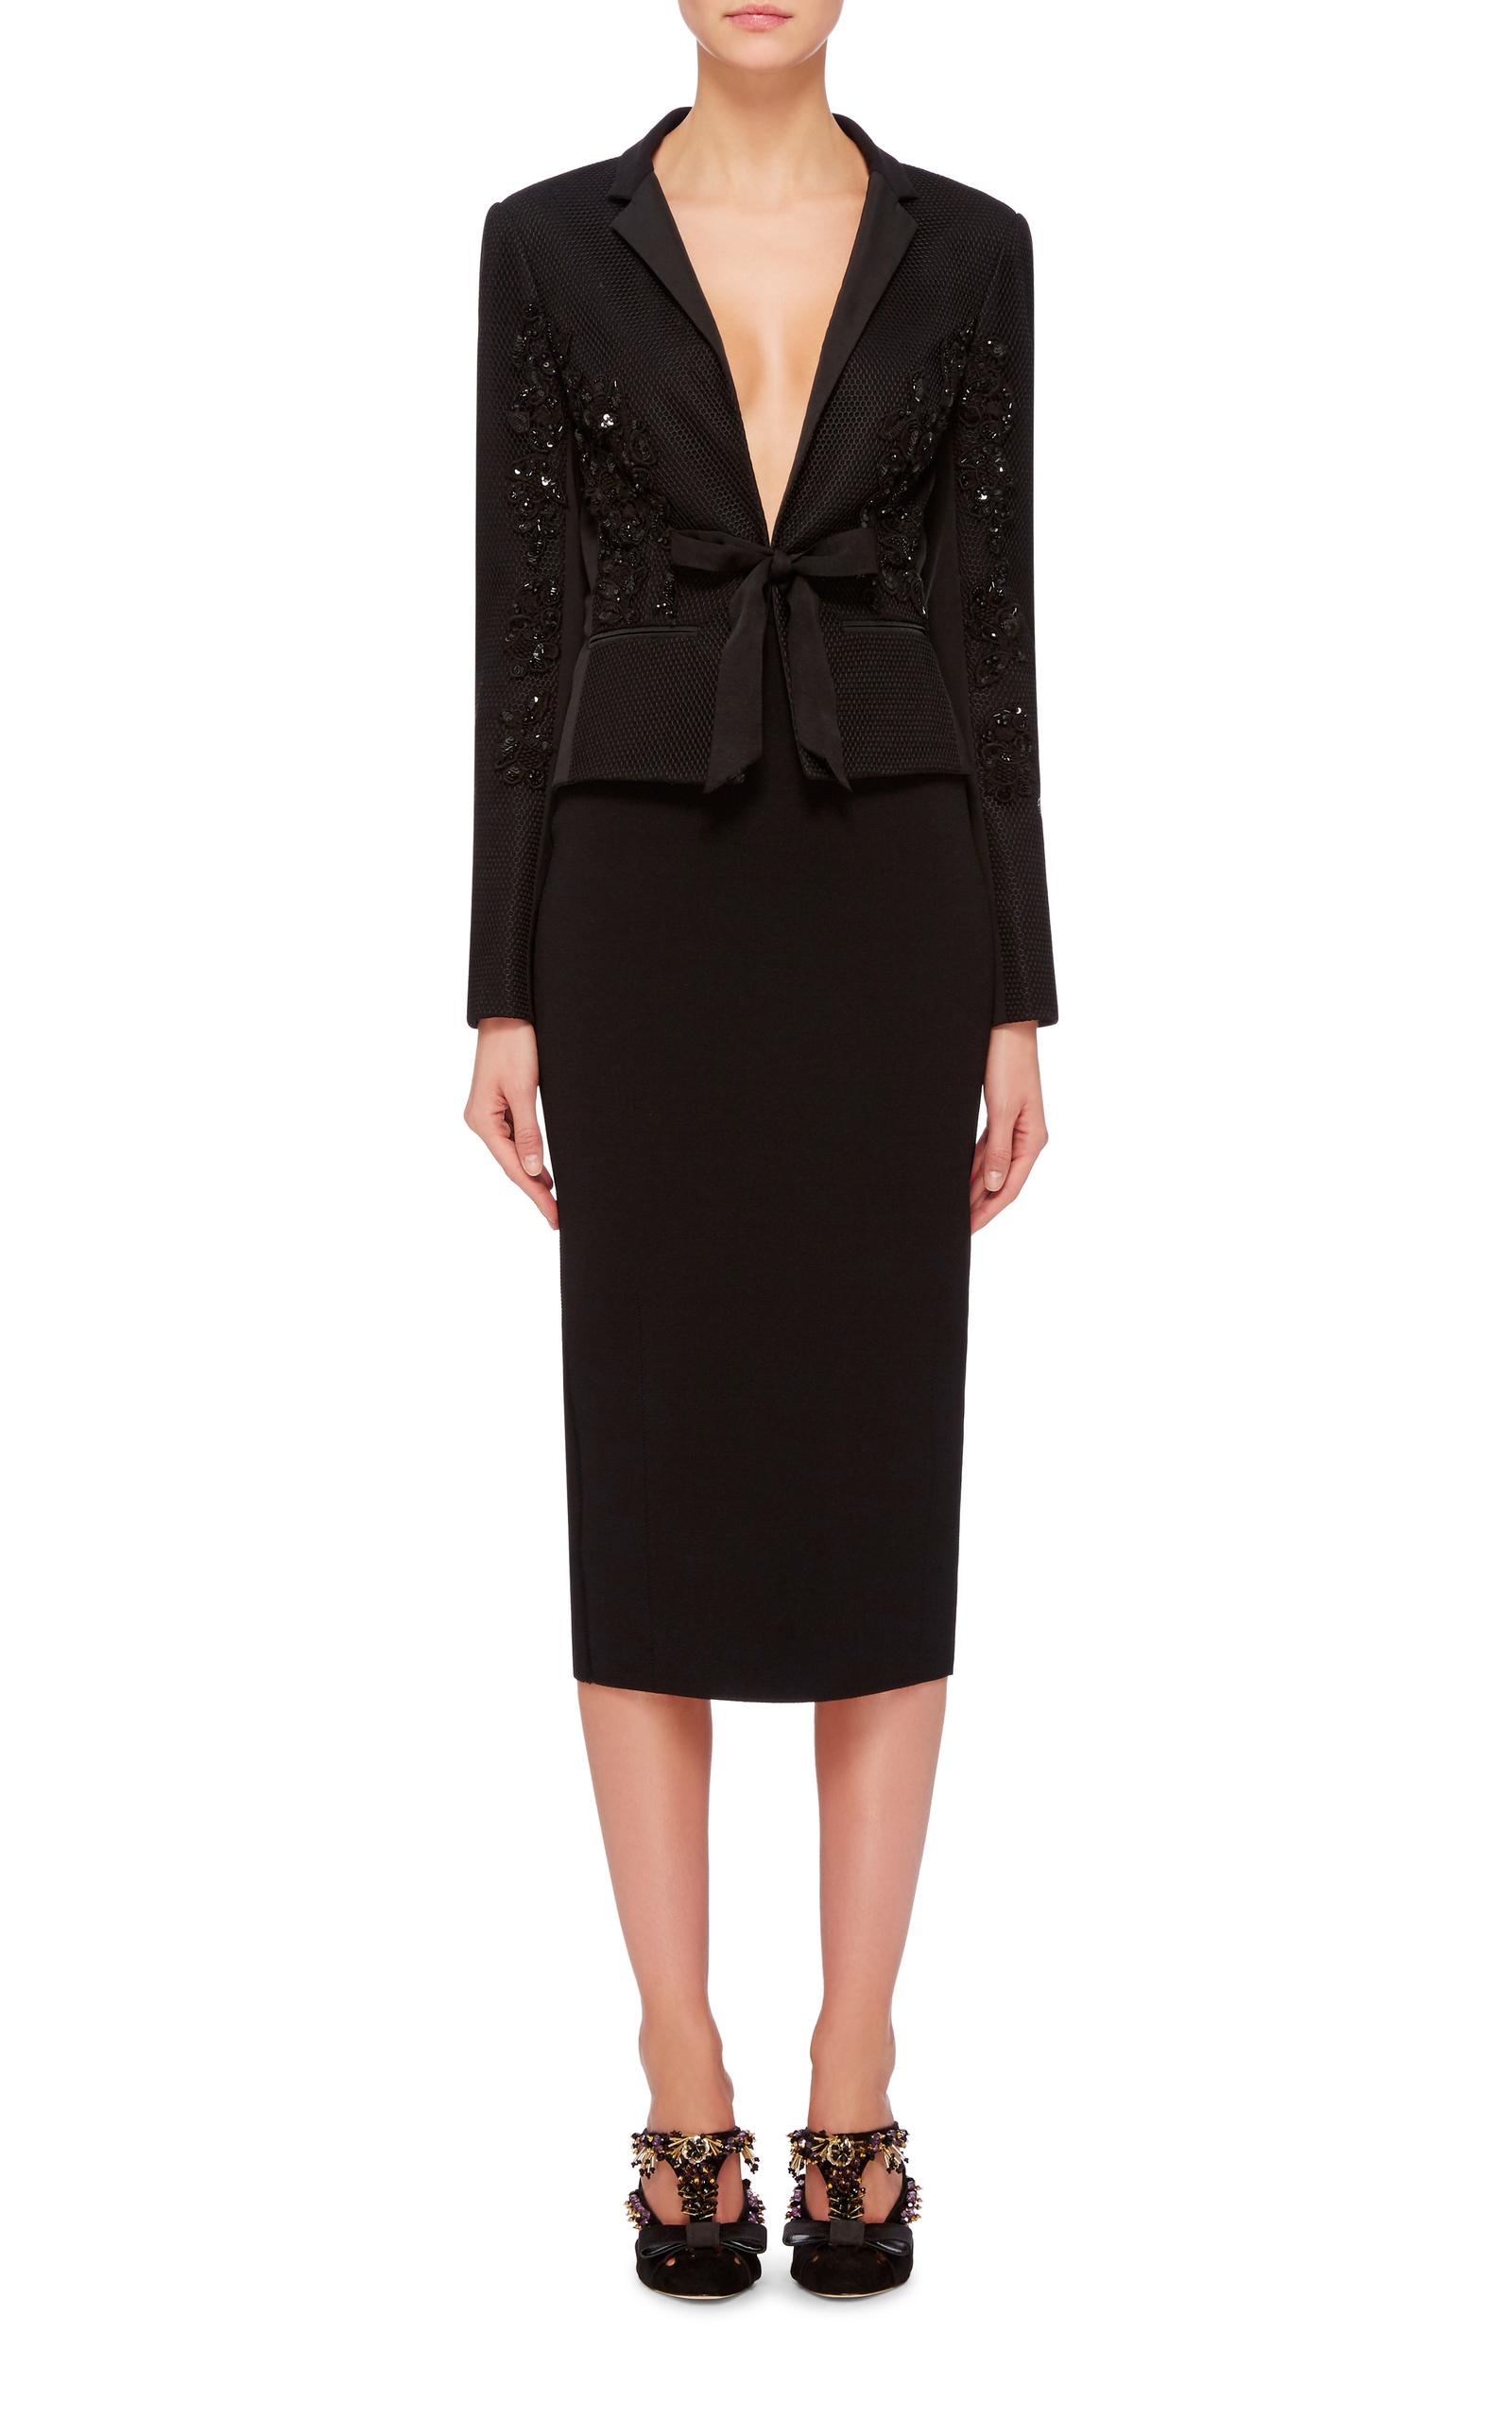 Black Mid Length Pencil Skirt by Oscar de la Renta | Moda Operandi